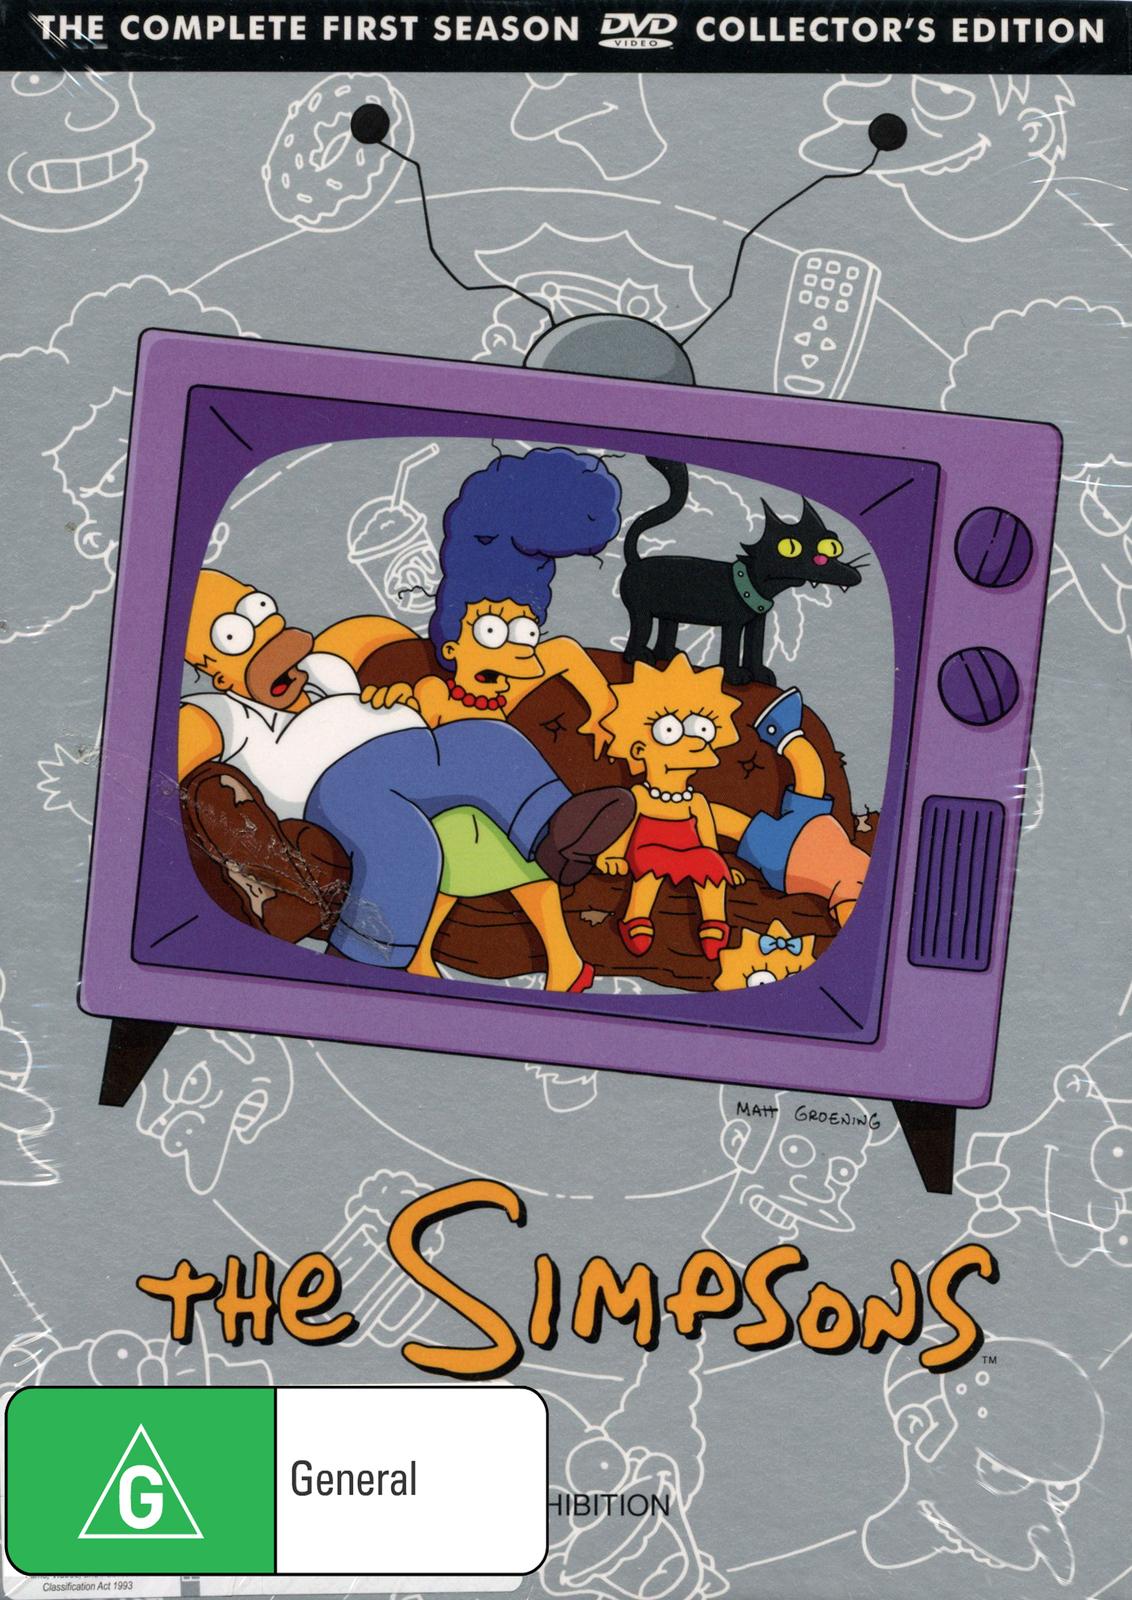 The Simpsons - Season 1 on DVD image